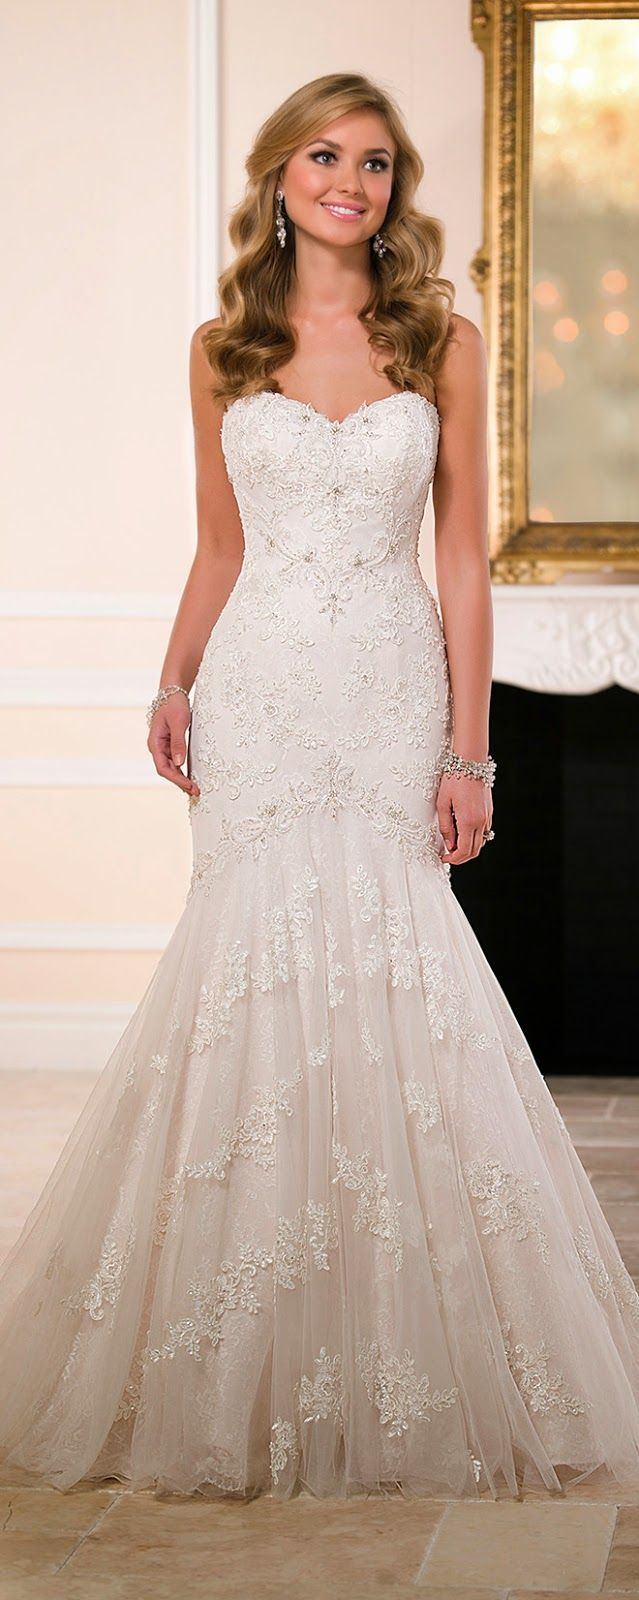 Trumpet style wedding dresses   best Future wedding images on Pinterest  Wedding inspiration